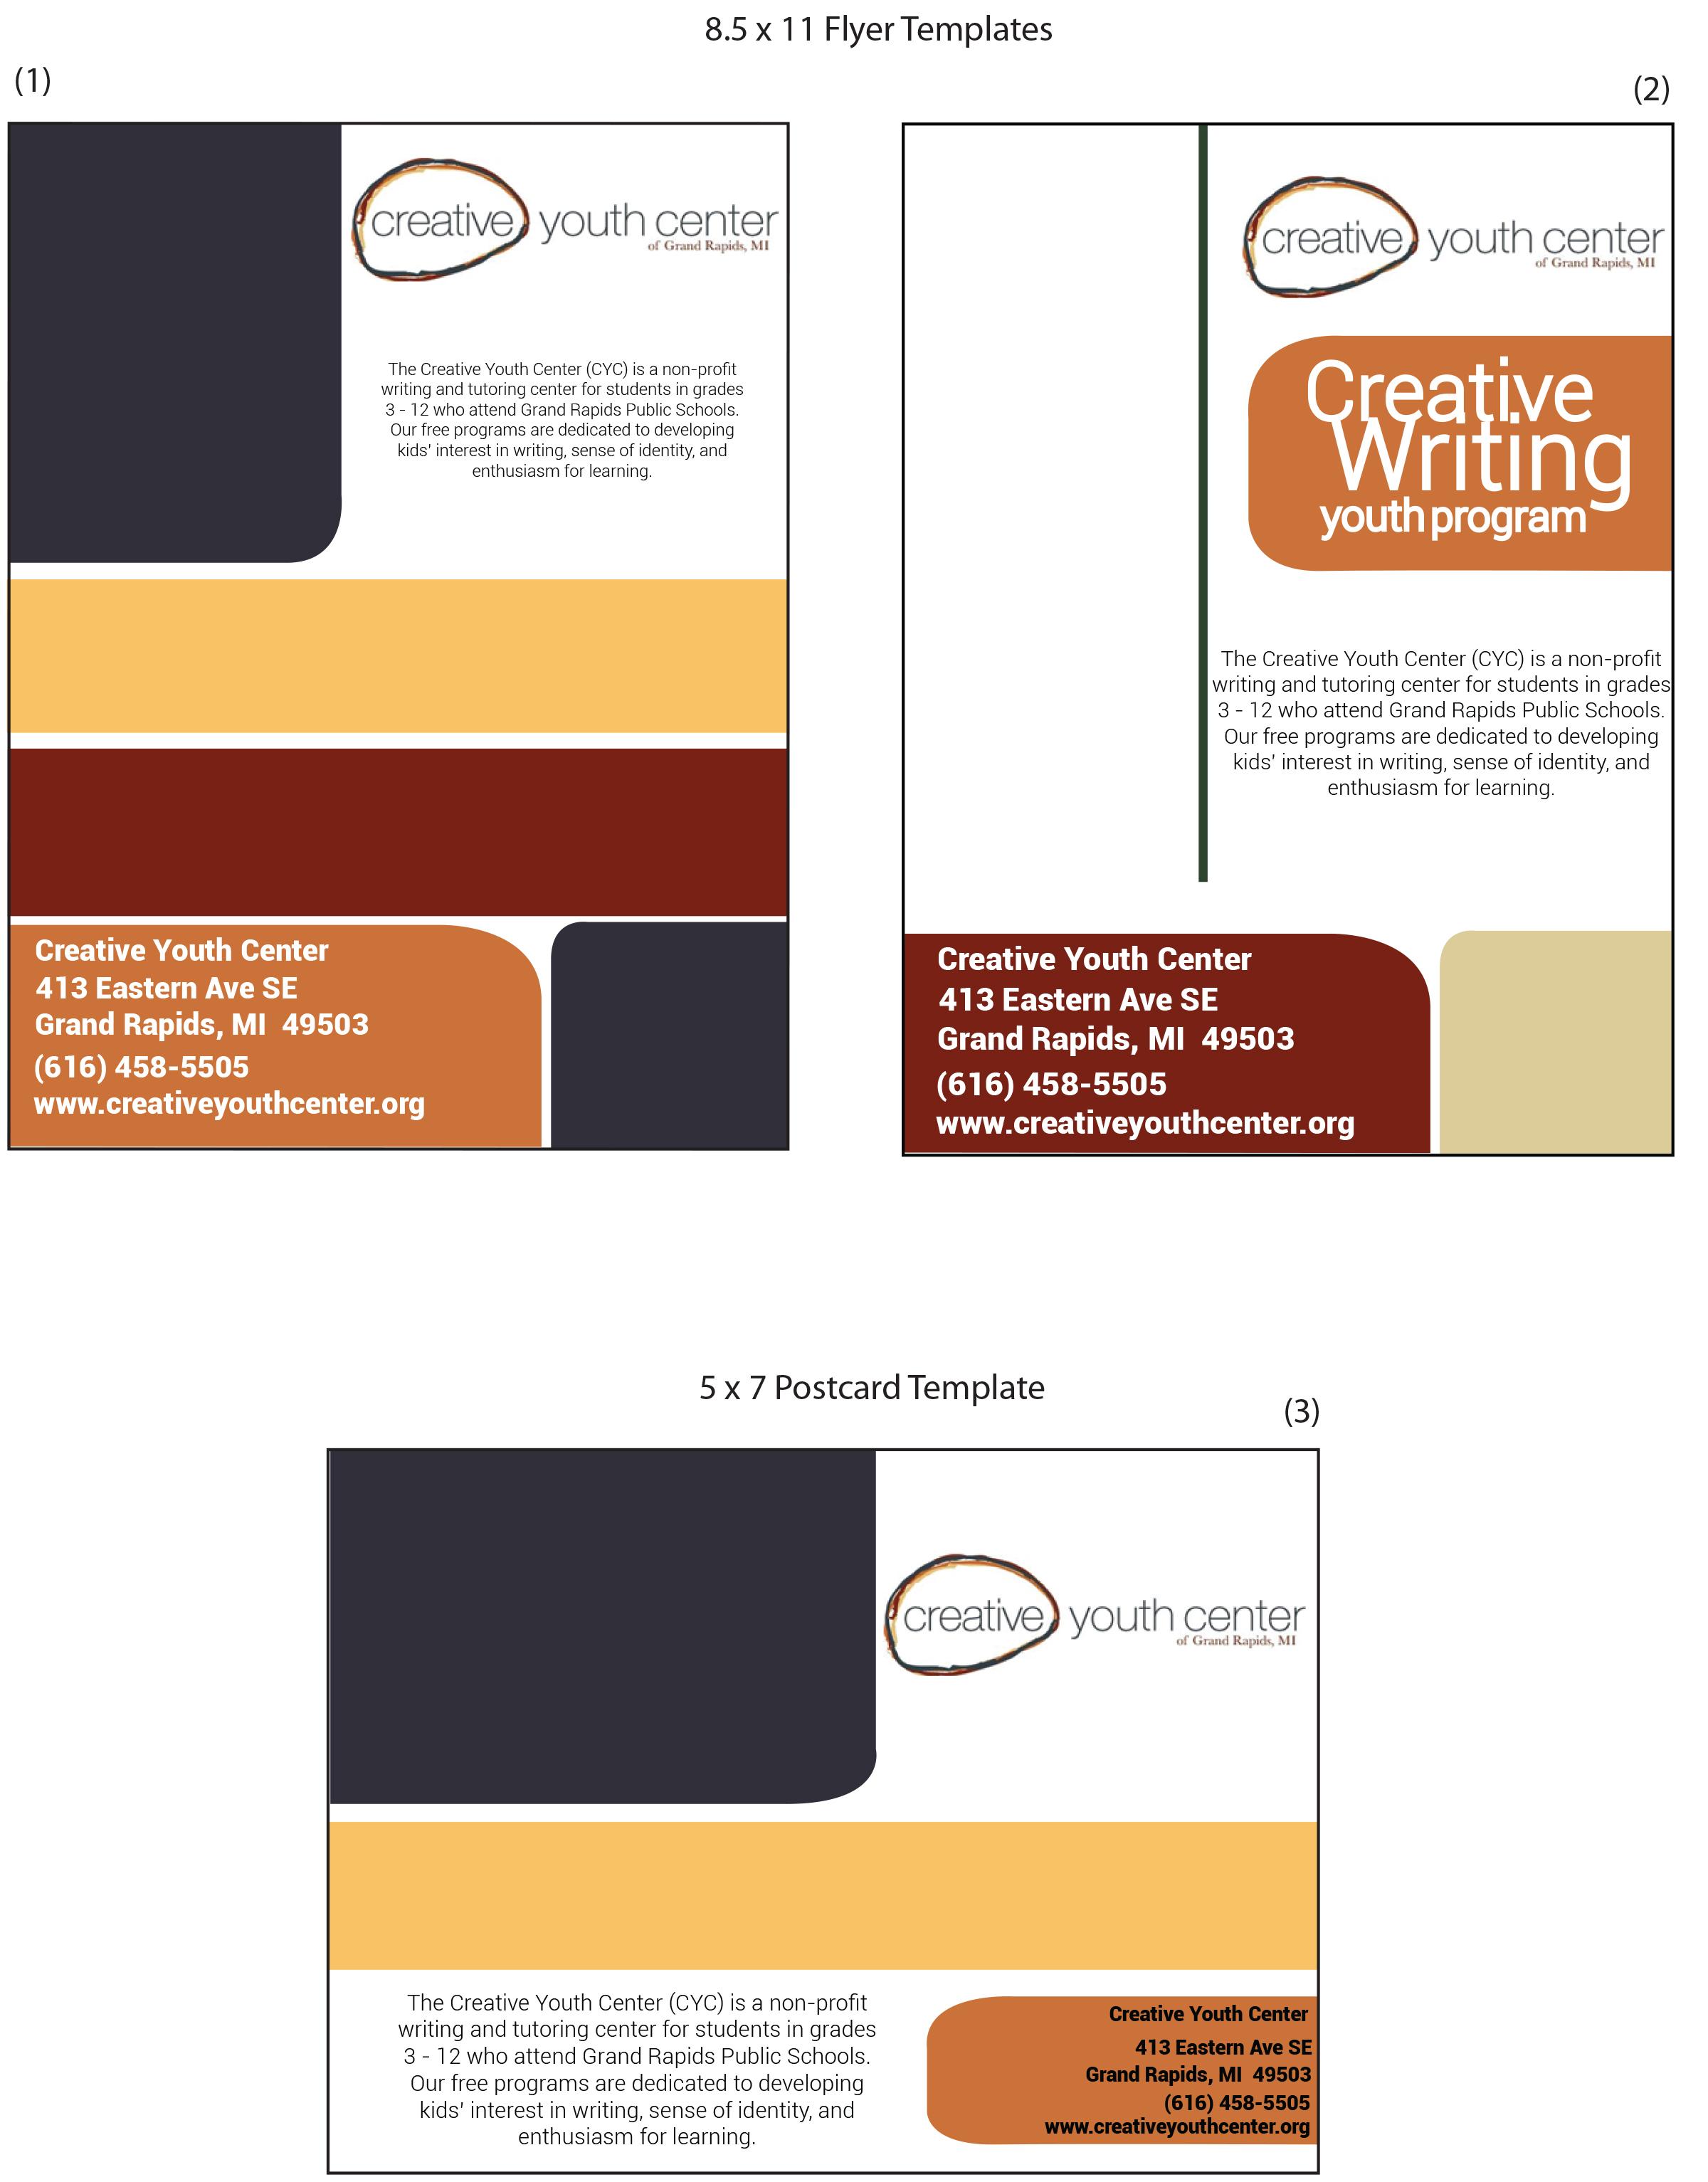 graphic design tardy art